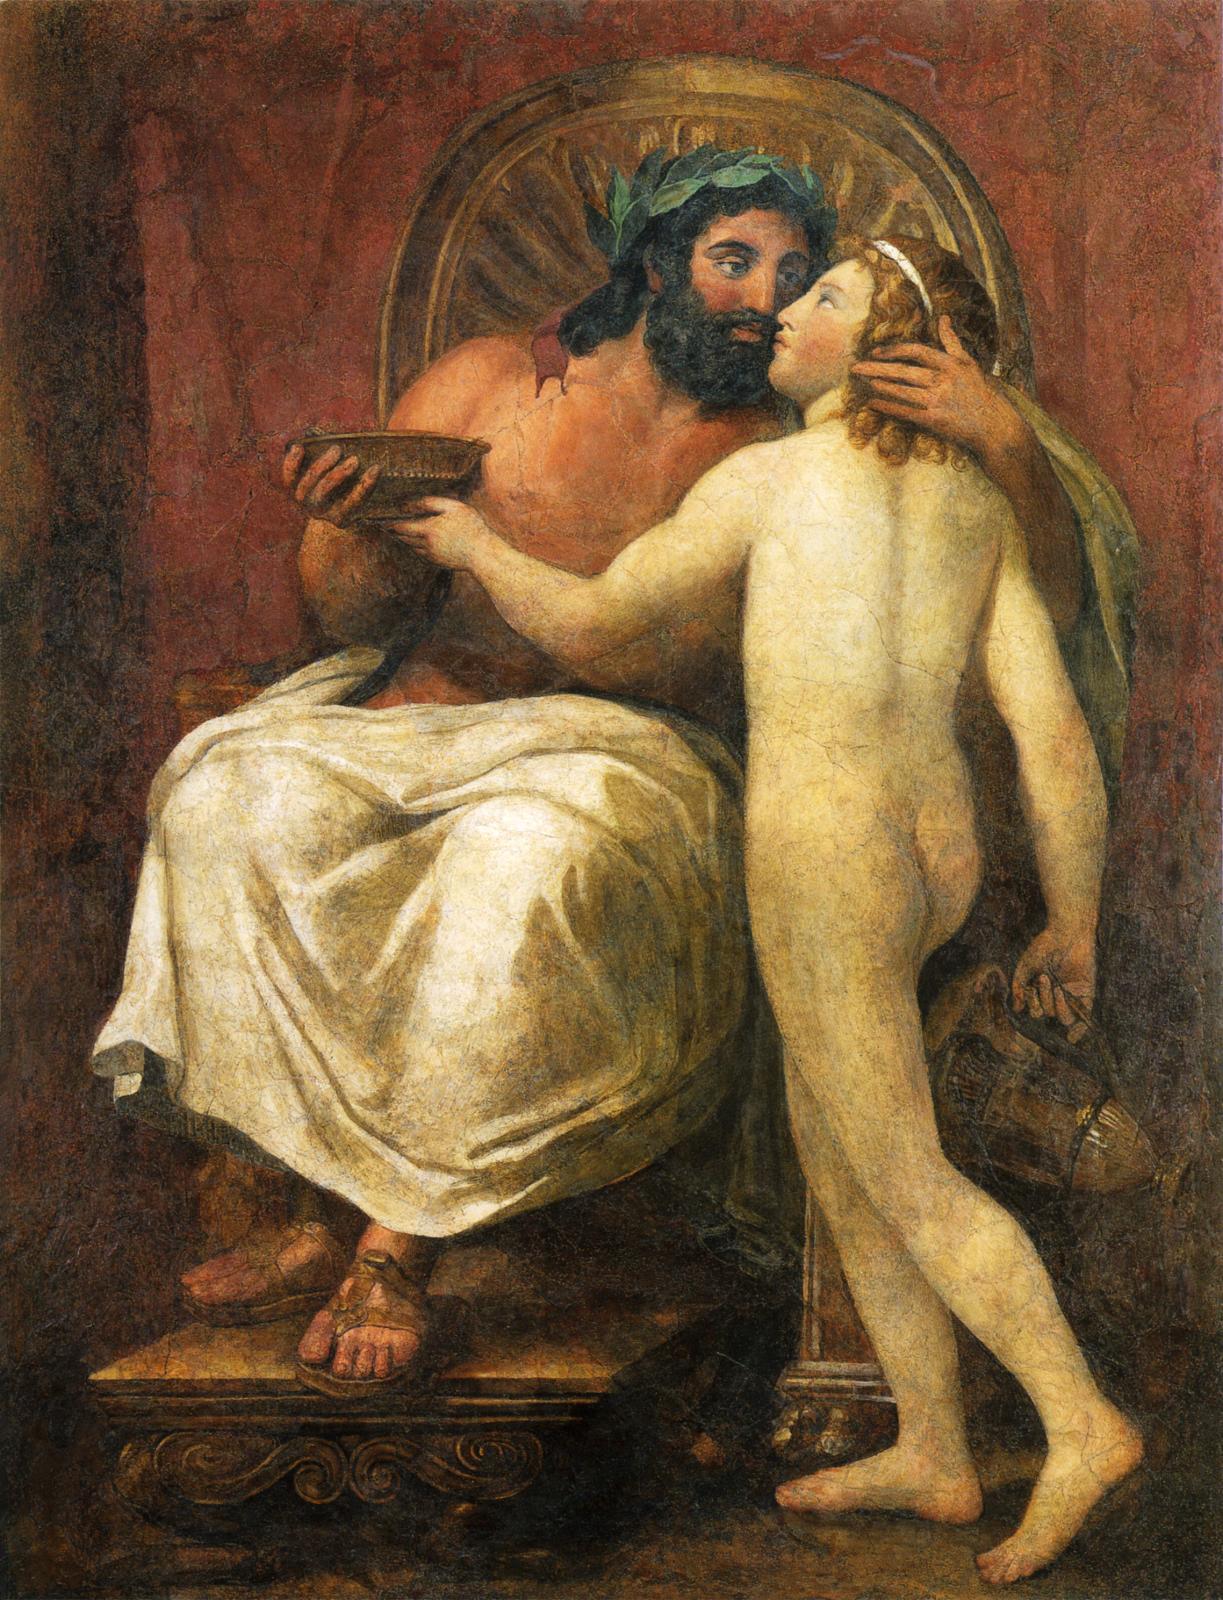 Attribué à Raphaël Mengs, Jupiter et Ganymède, 1758-1759, fresque, Rome, Galleria Nazionaled'Arte Antica.